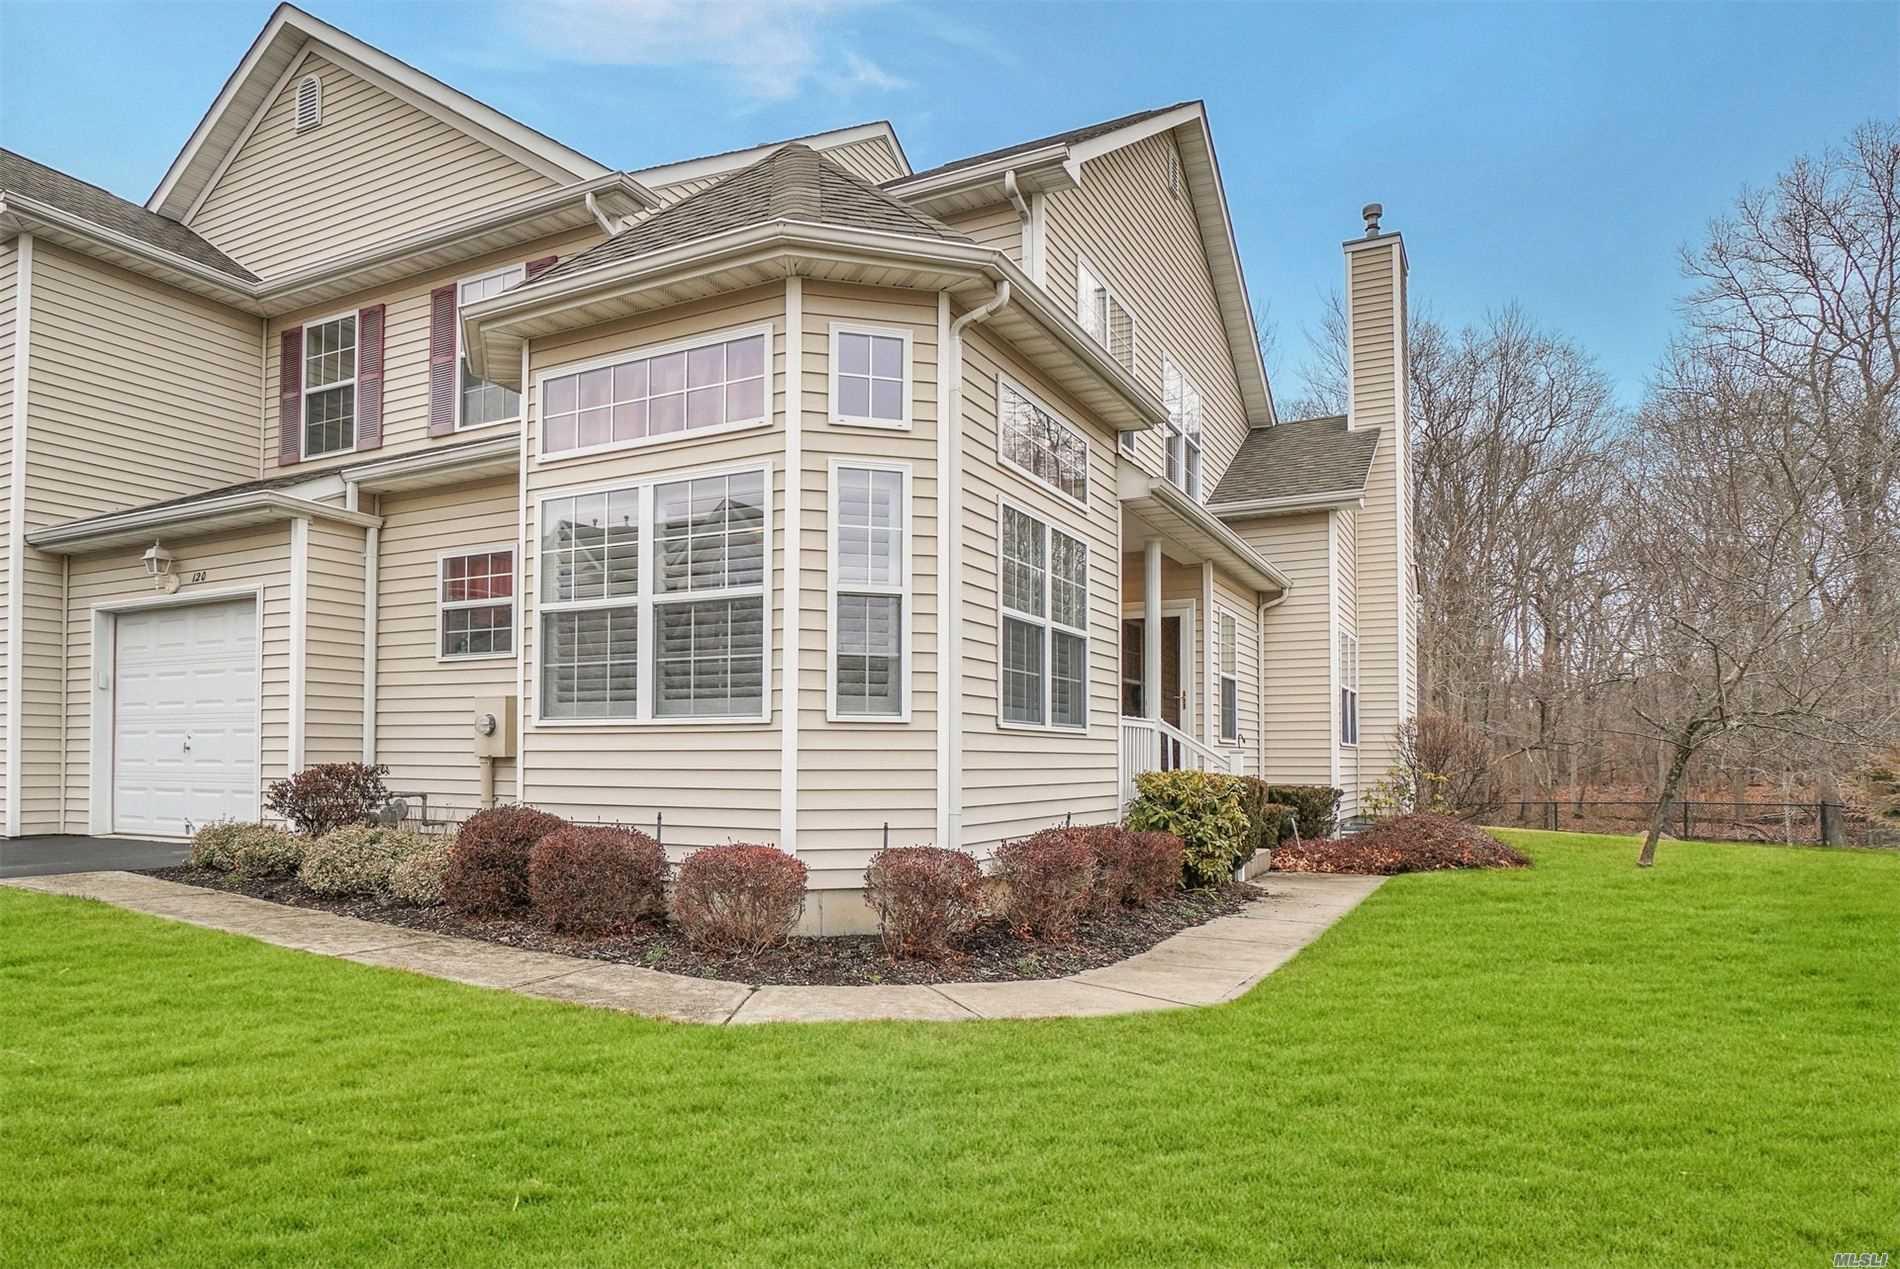 Property for sale at 120 Kettles Lane, Medford NY 11763, Medford,  New York 11763